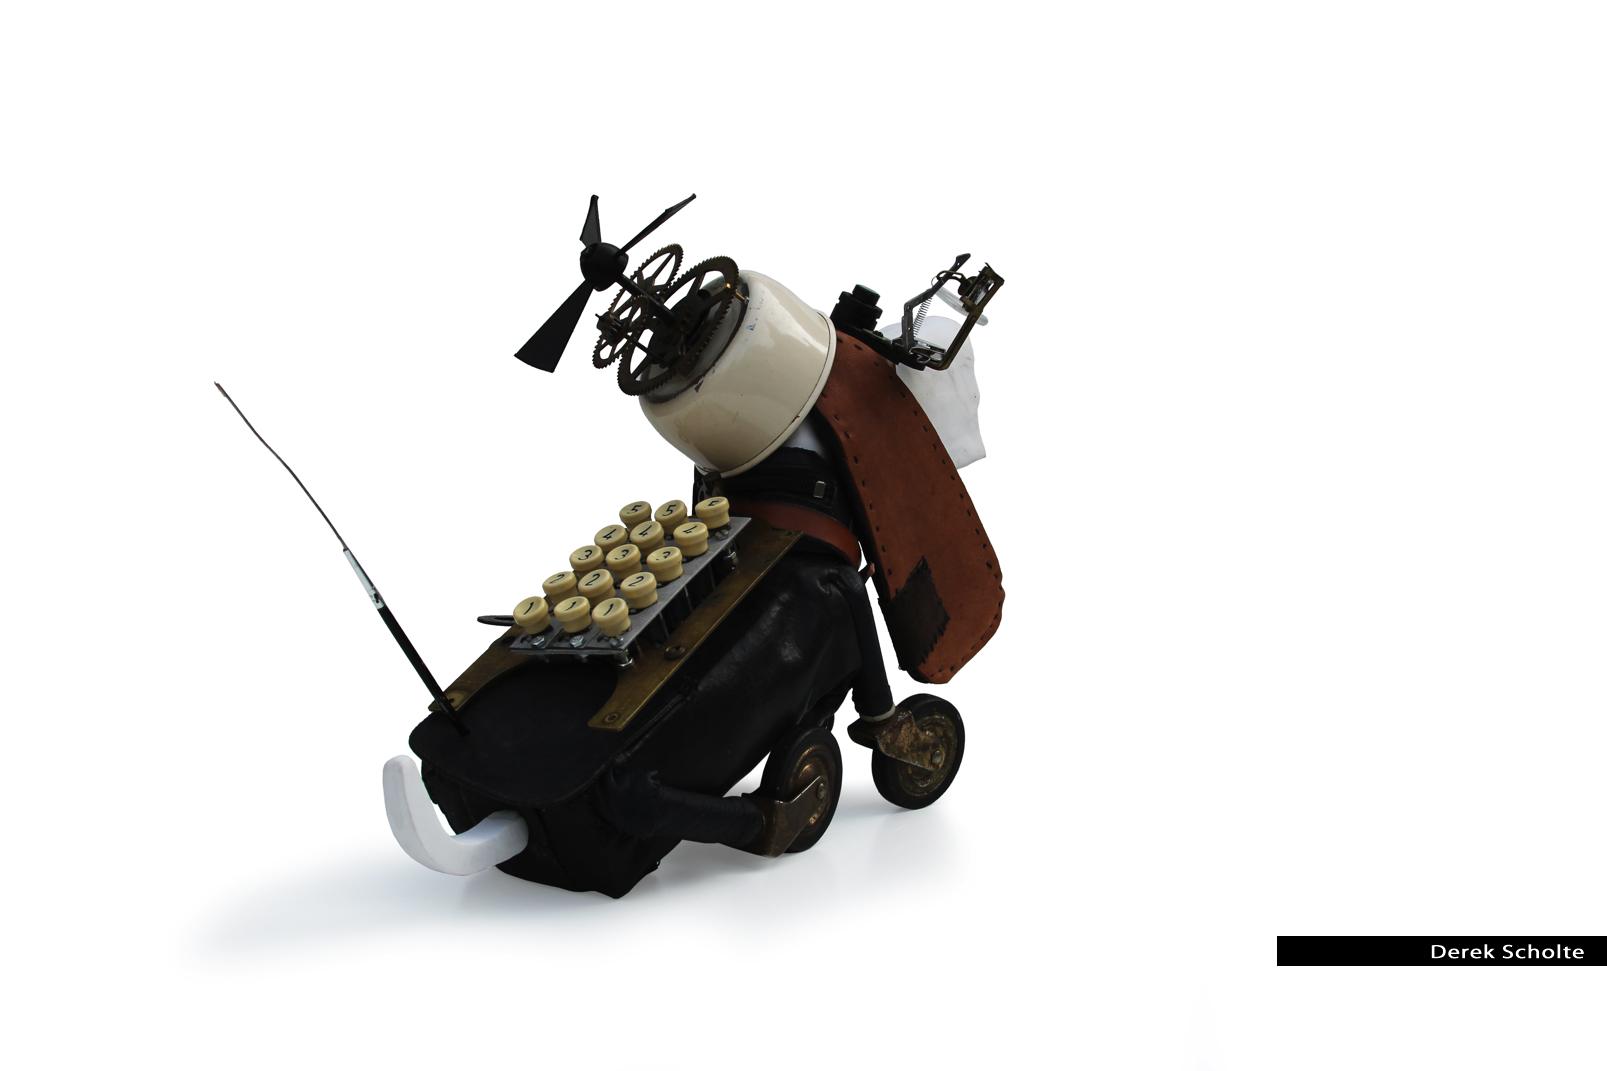 Nevil, assemblage art dog sculpture